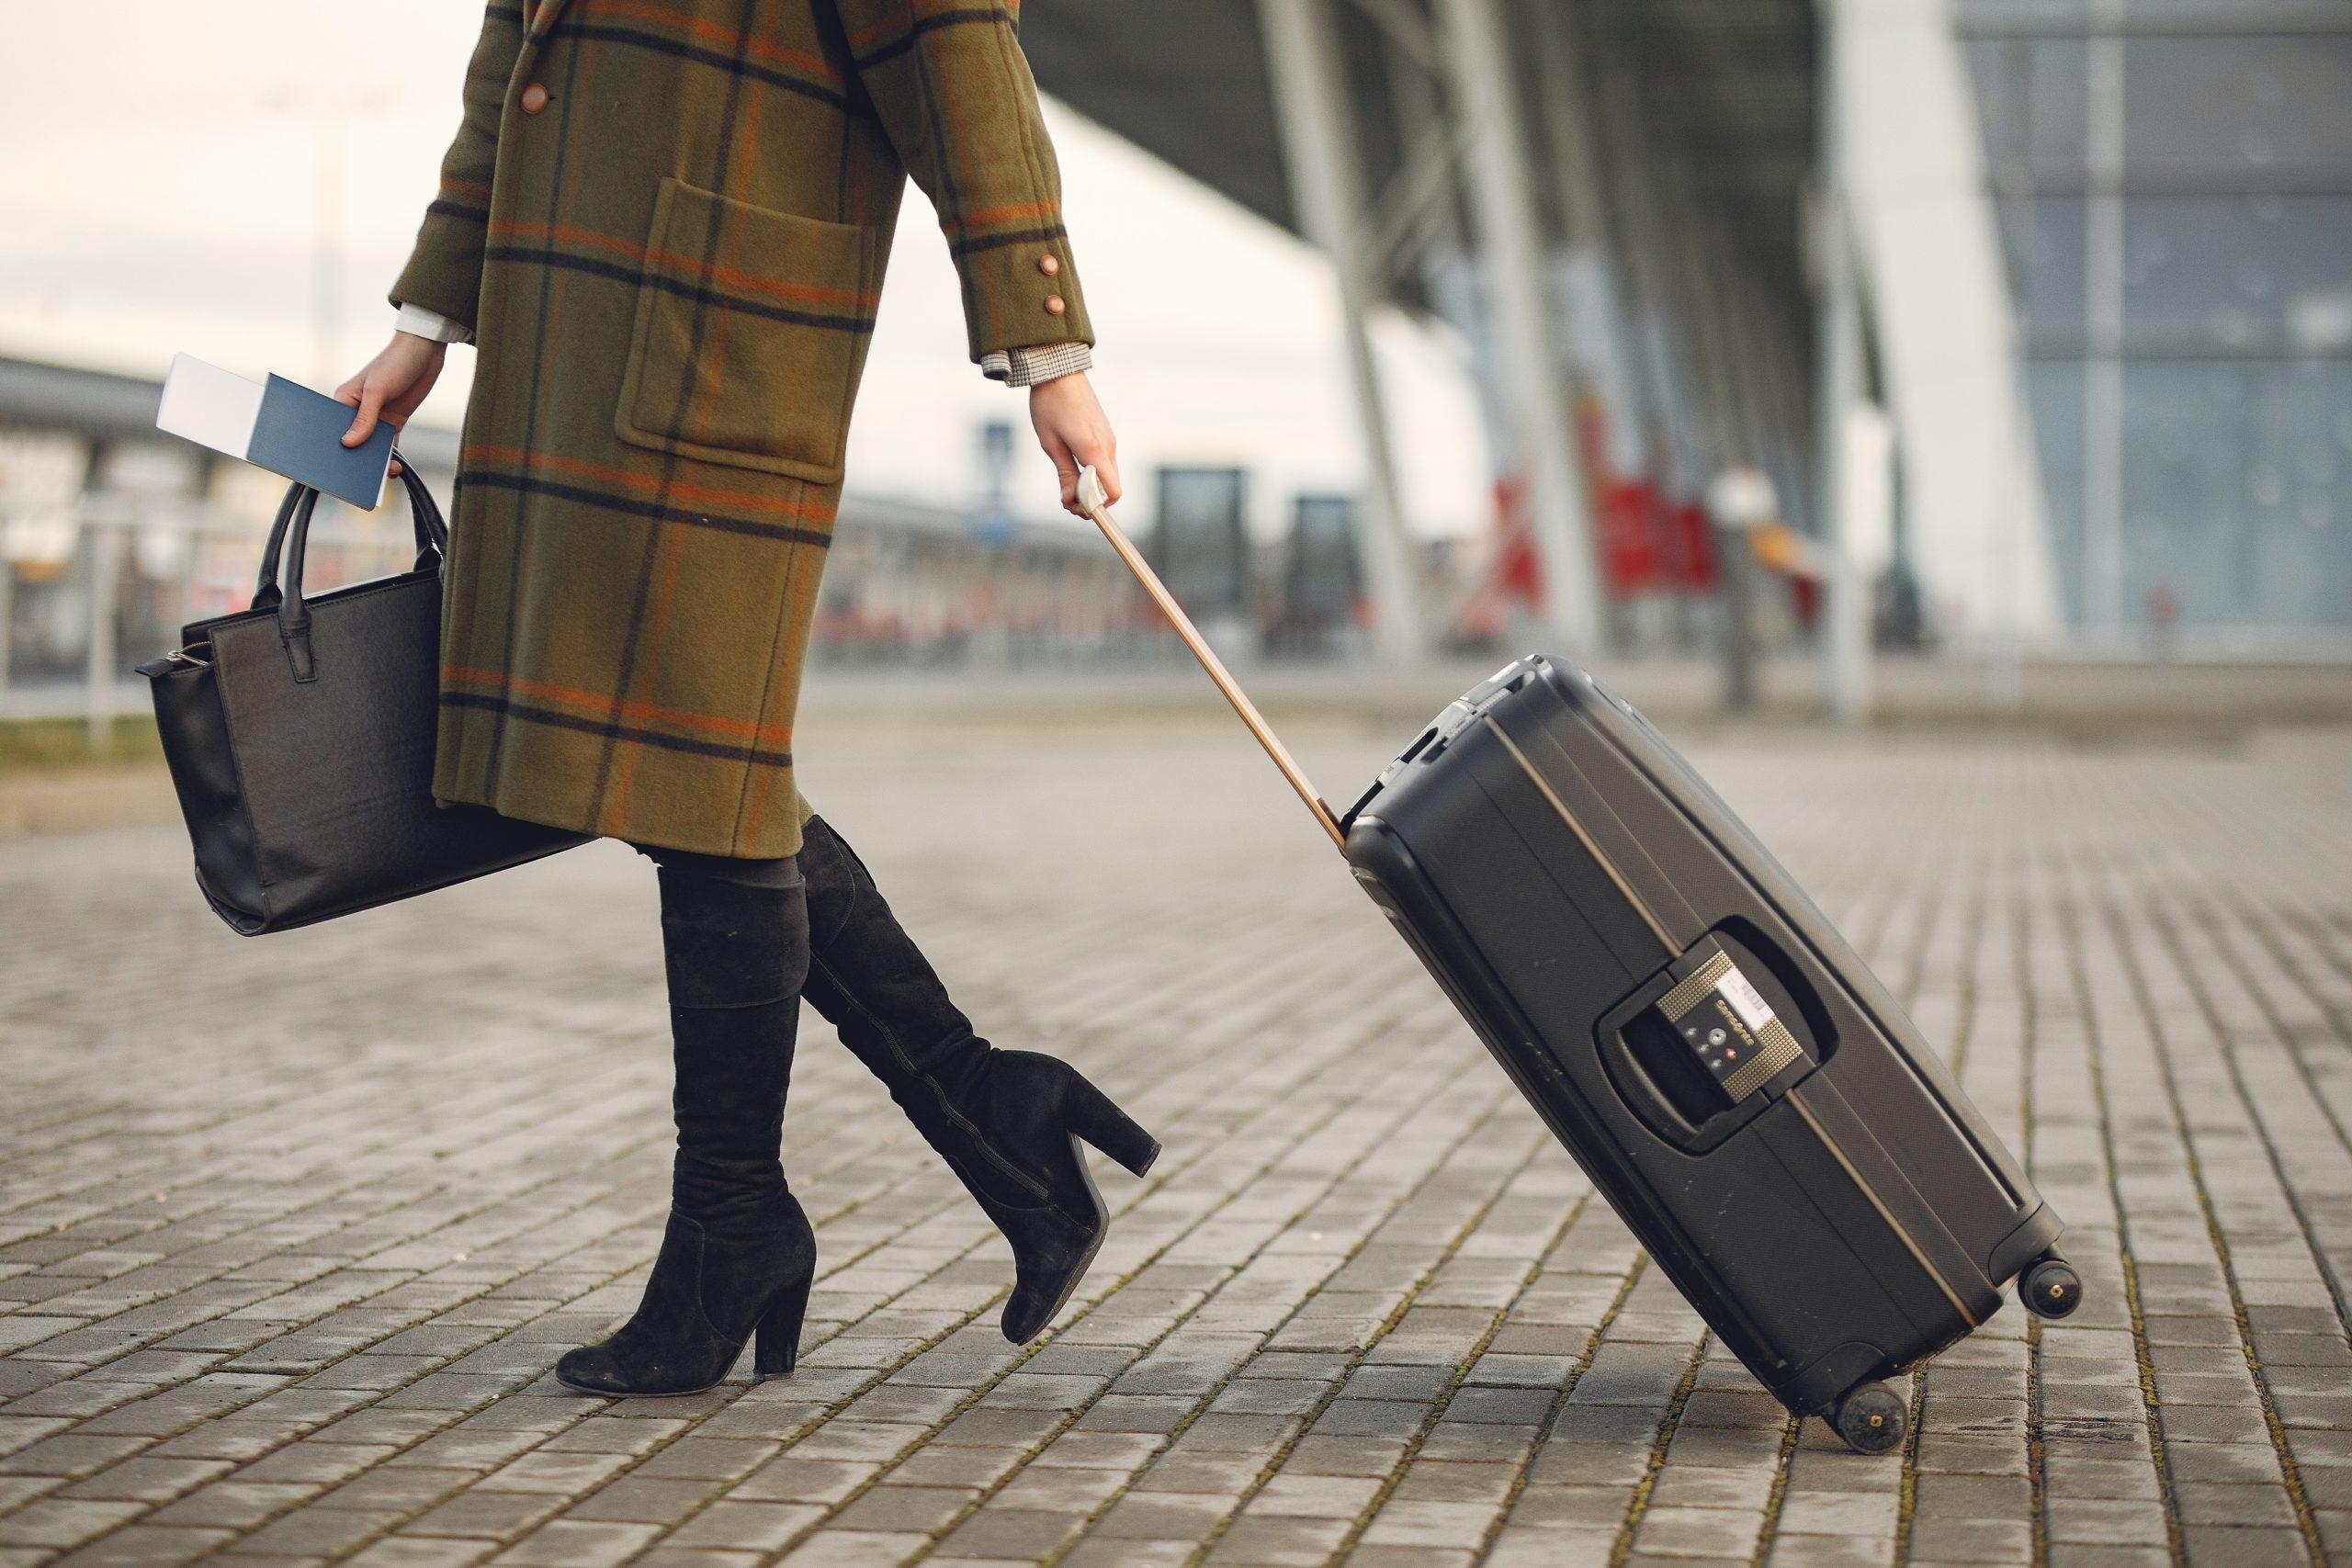 Lakukan 6 Hal Ini Agar Kopermu Tidak Tertukar di Bandara